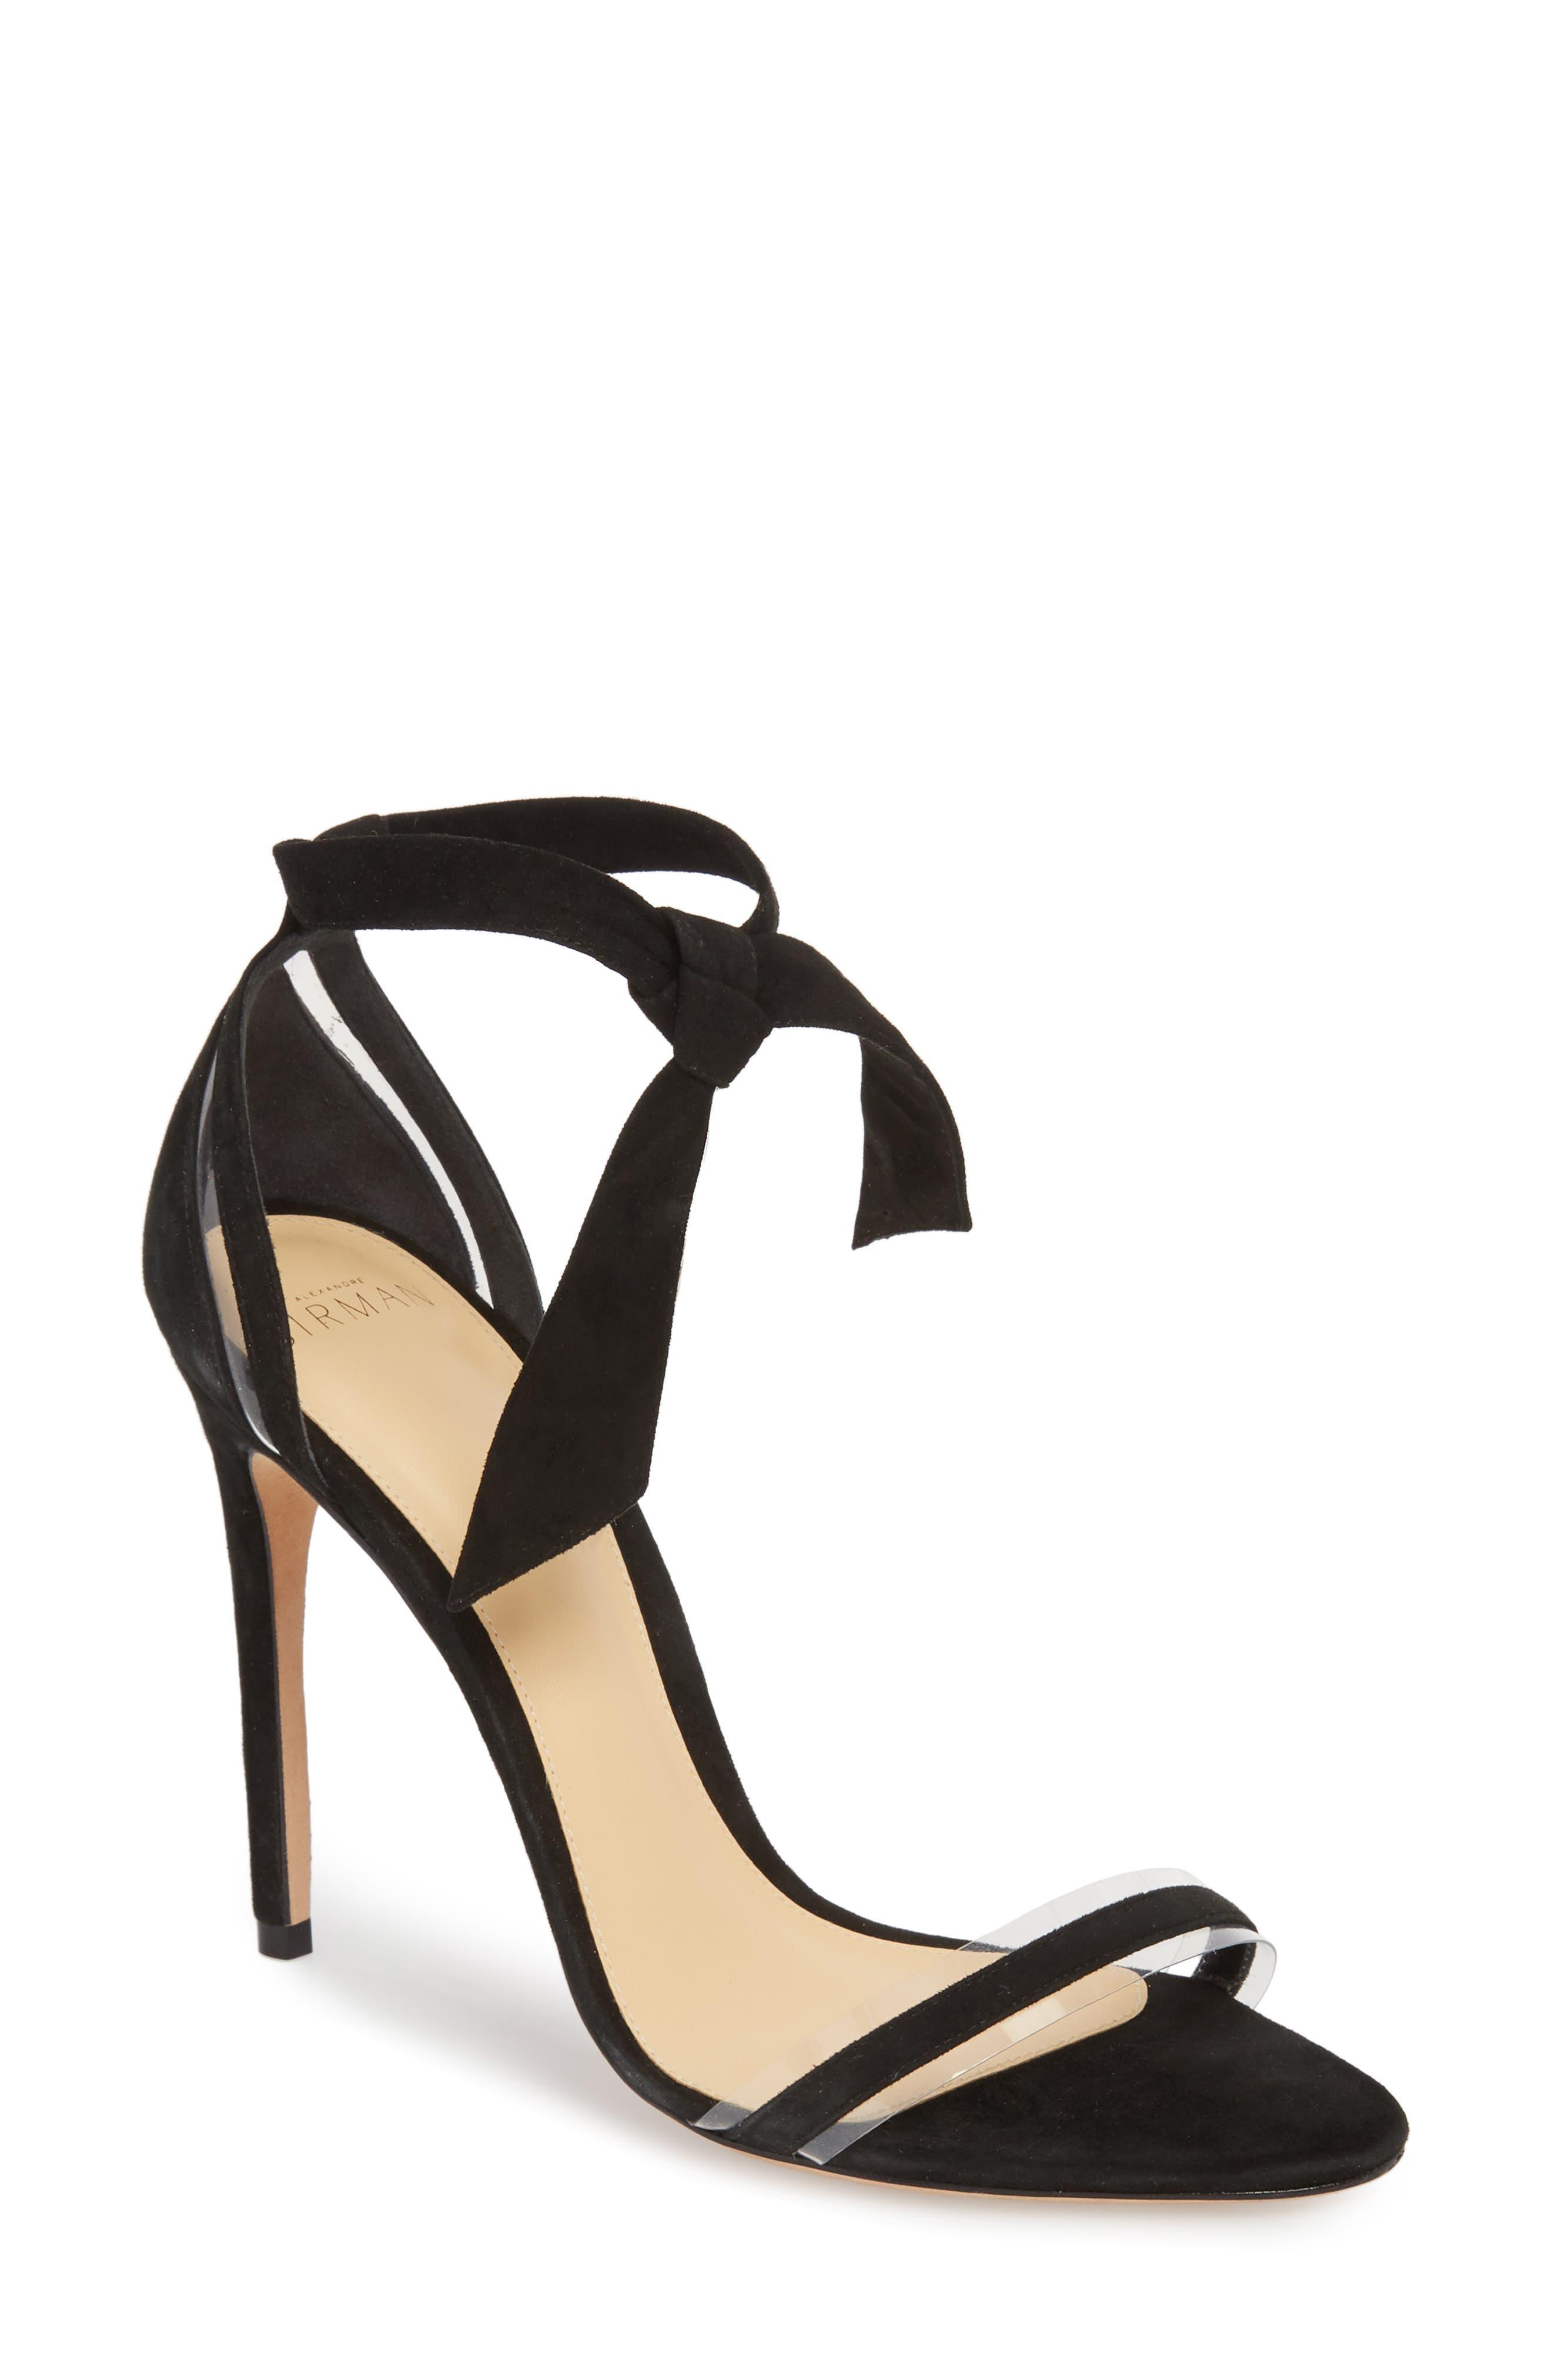 ALEXANDRE BIRMAN Clarita Clear Ankle Tie Sandal, Main, color, BLACK/ TRANSPARENT